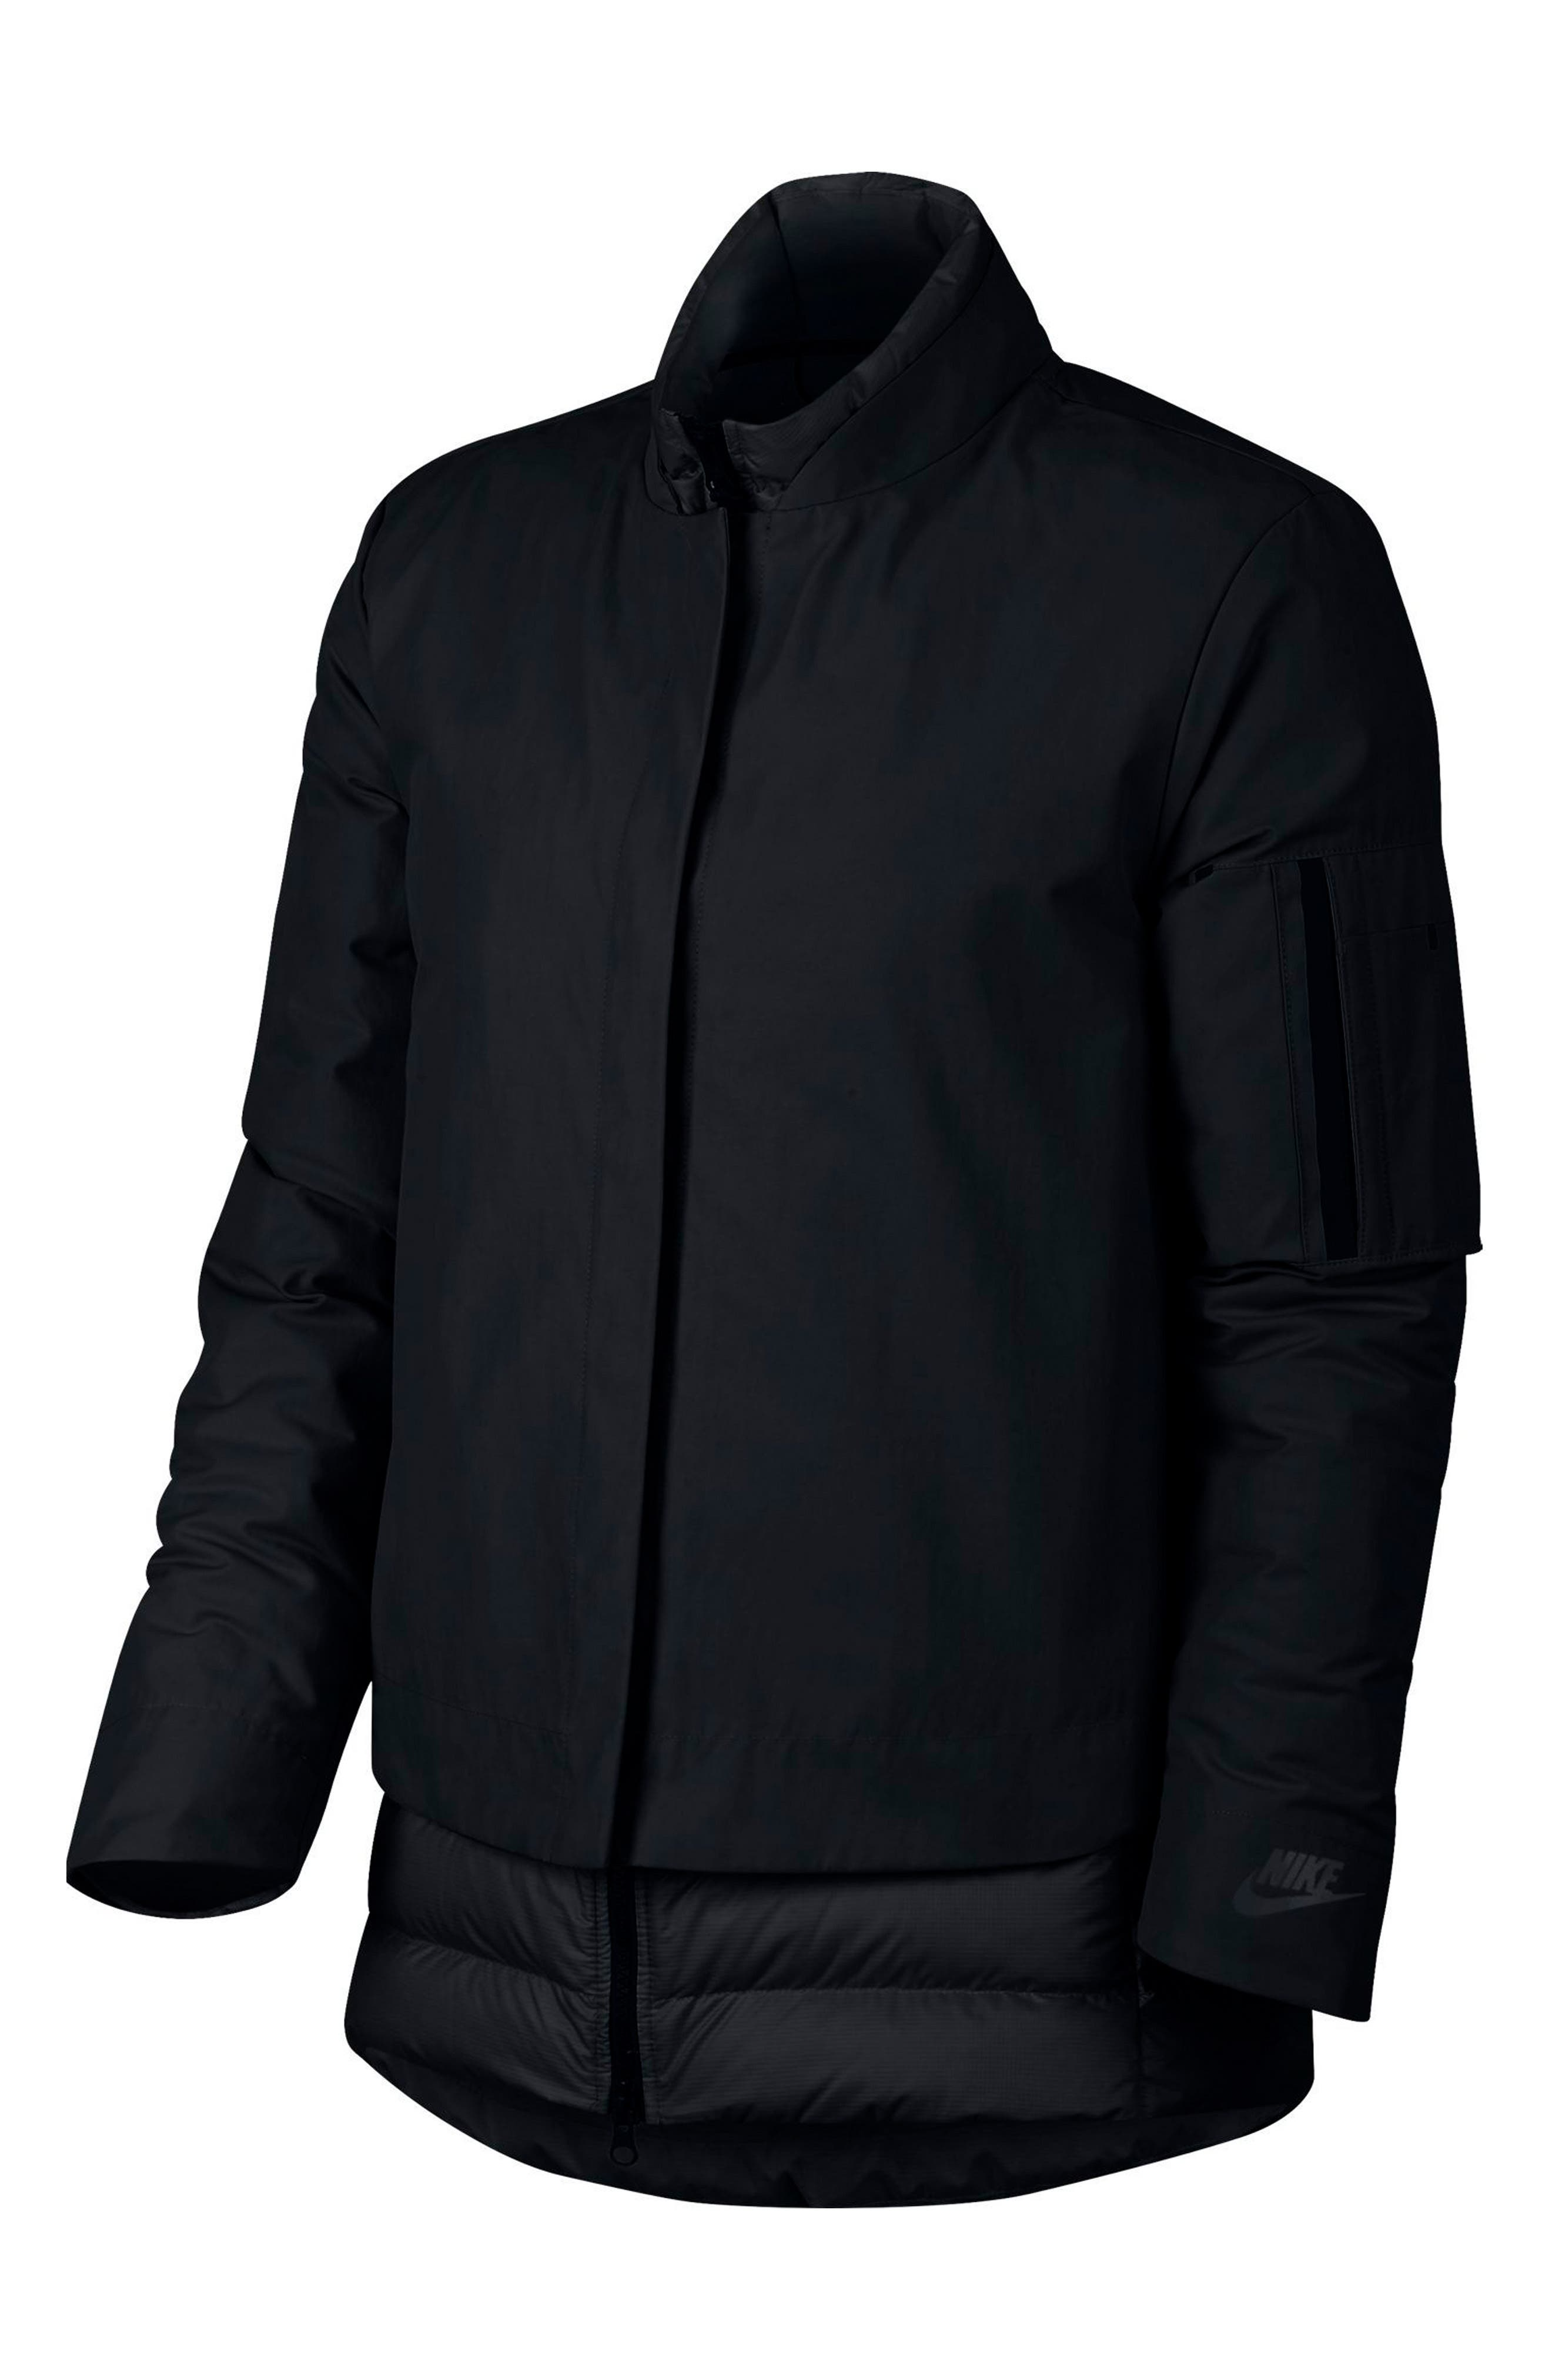 Sportswear AeroLoft 3-in-1 Down Jacket,                             Alternate thumbnail 11, color,                             Black/ Black/ Black